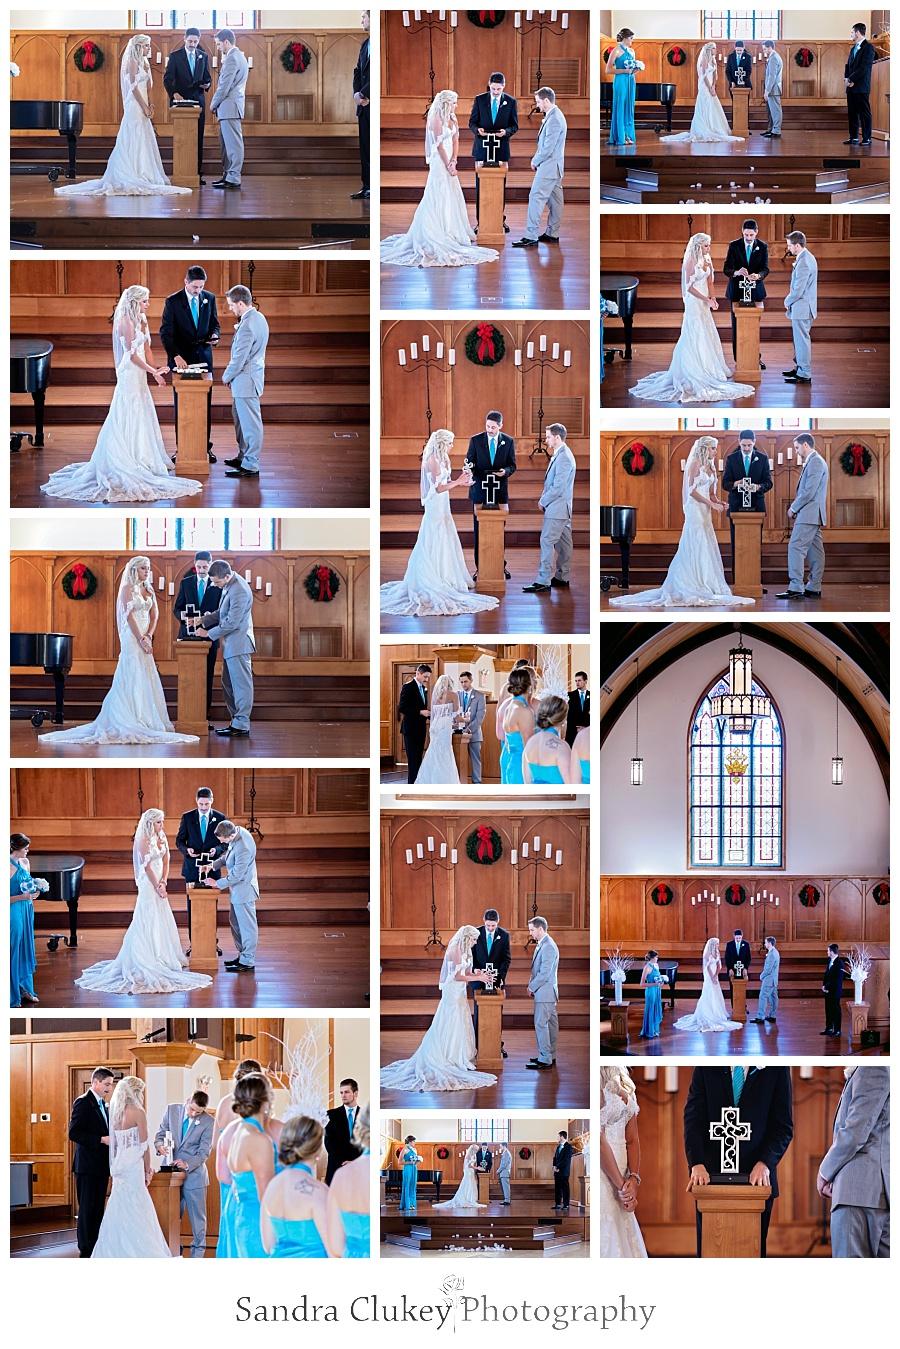 Wedding Ceremony at Lee University Chapel, Cleveland TN